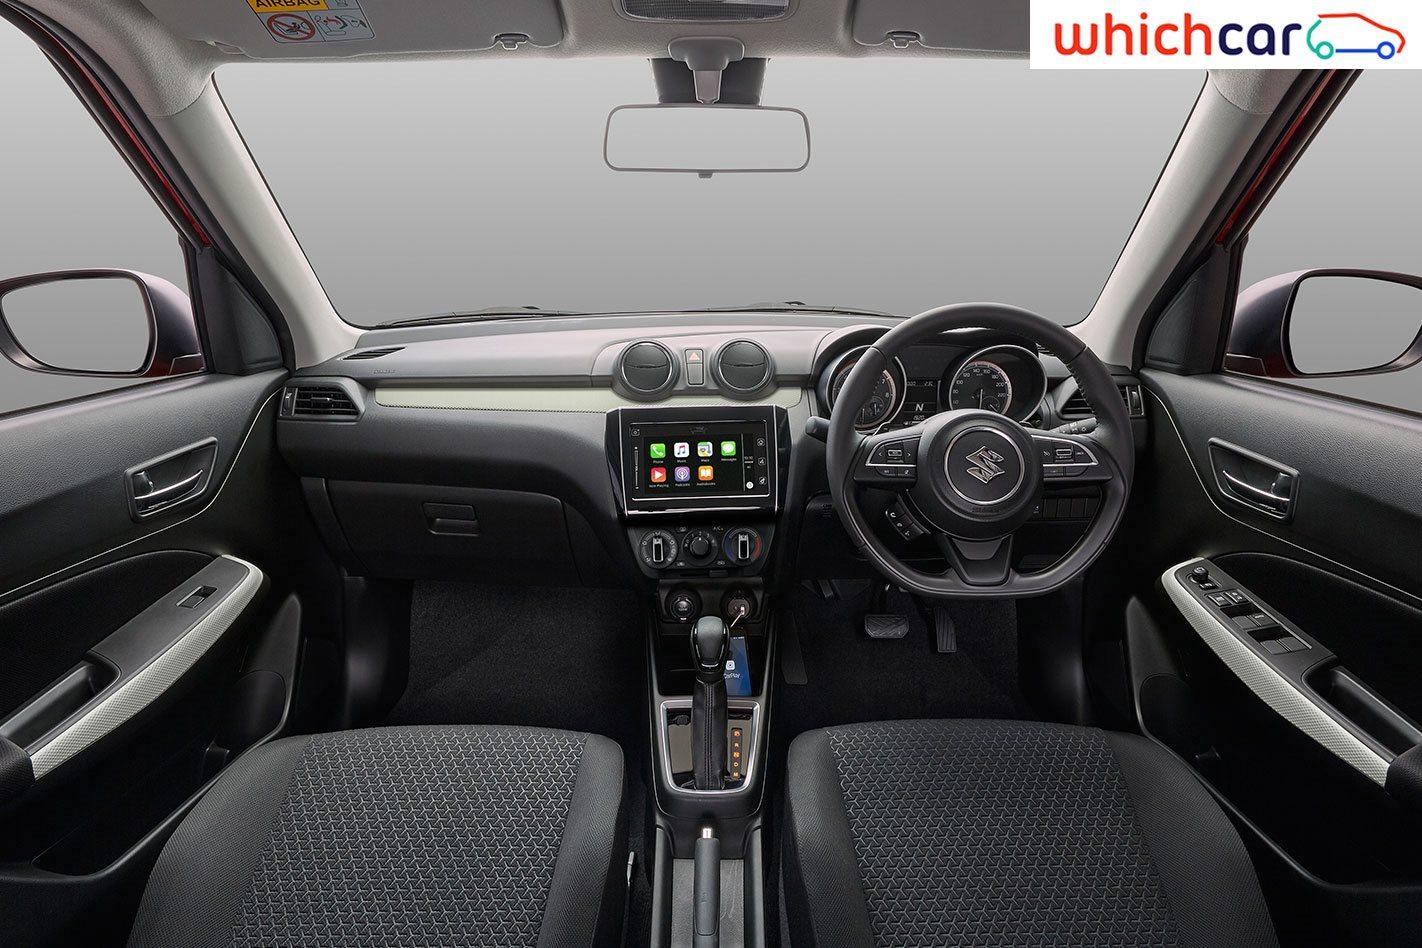 Suzuki swift gl review